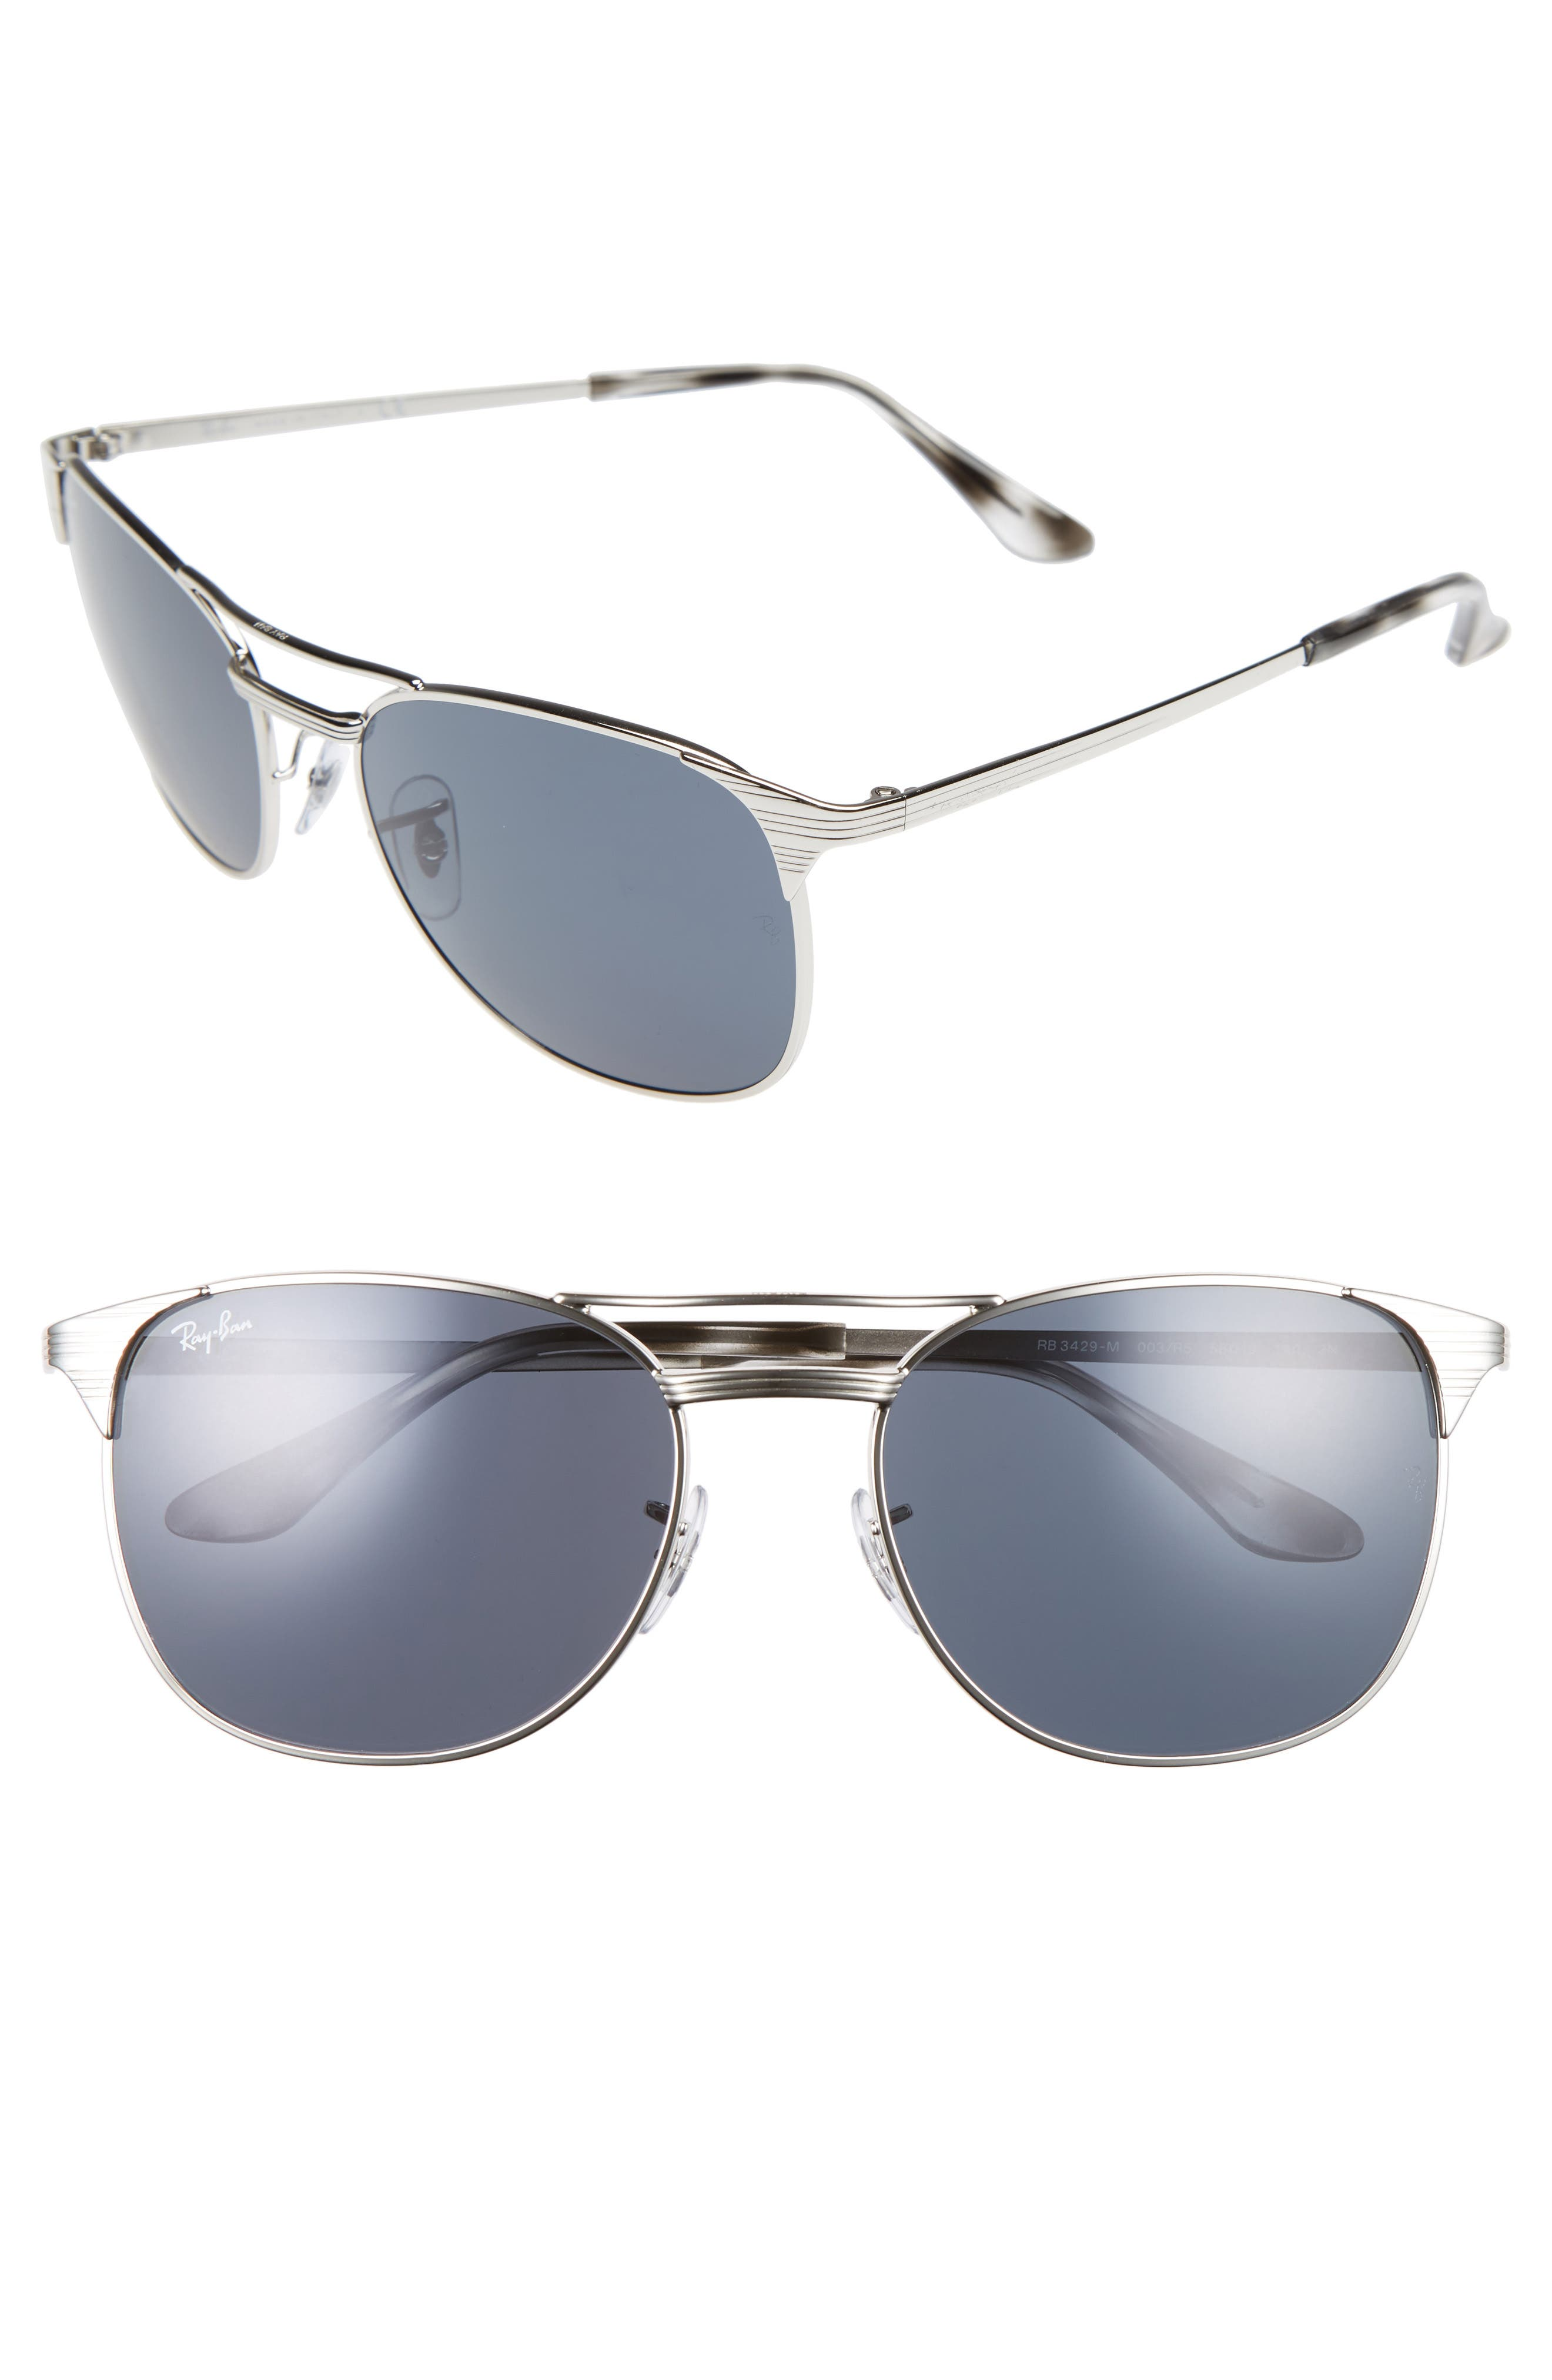 Ray-Ban Signet 58mm Square Sunglasses